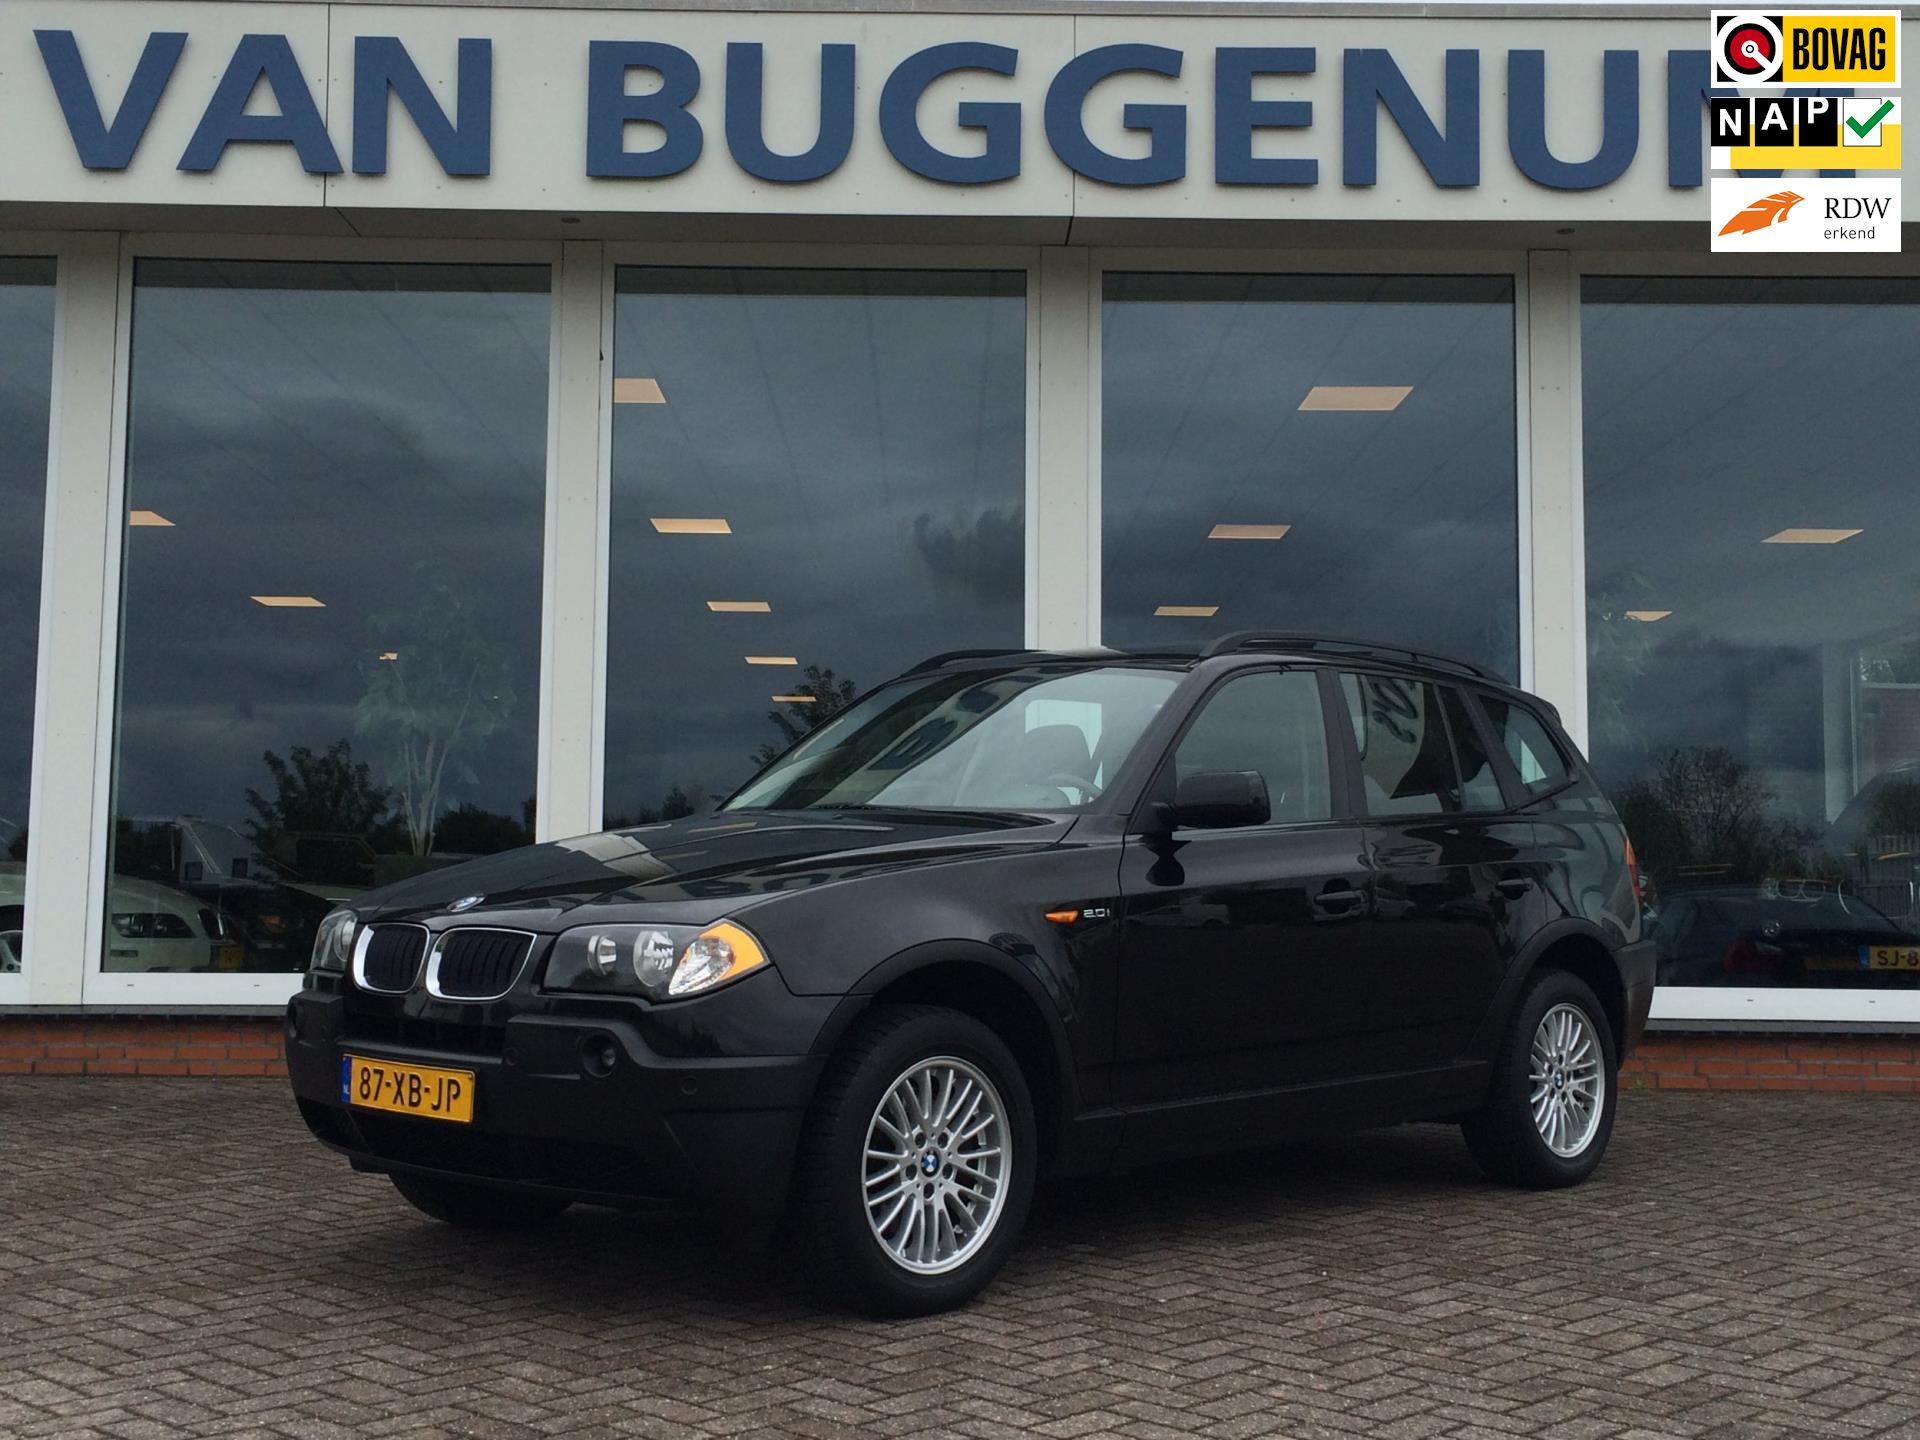 BMW X3 occasion - Automobielbedrijf J. van Buggenum